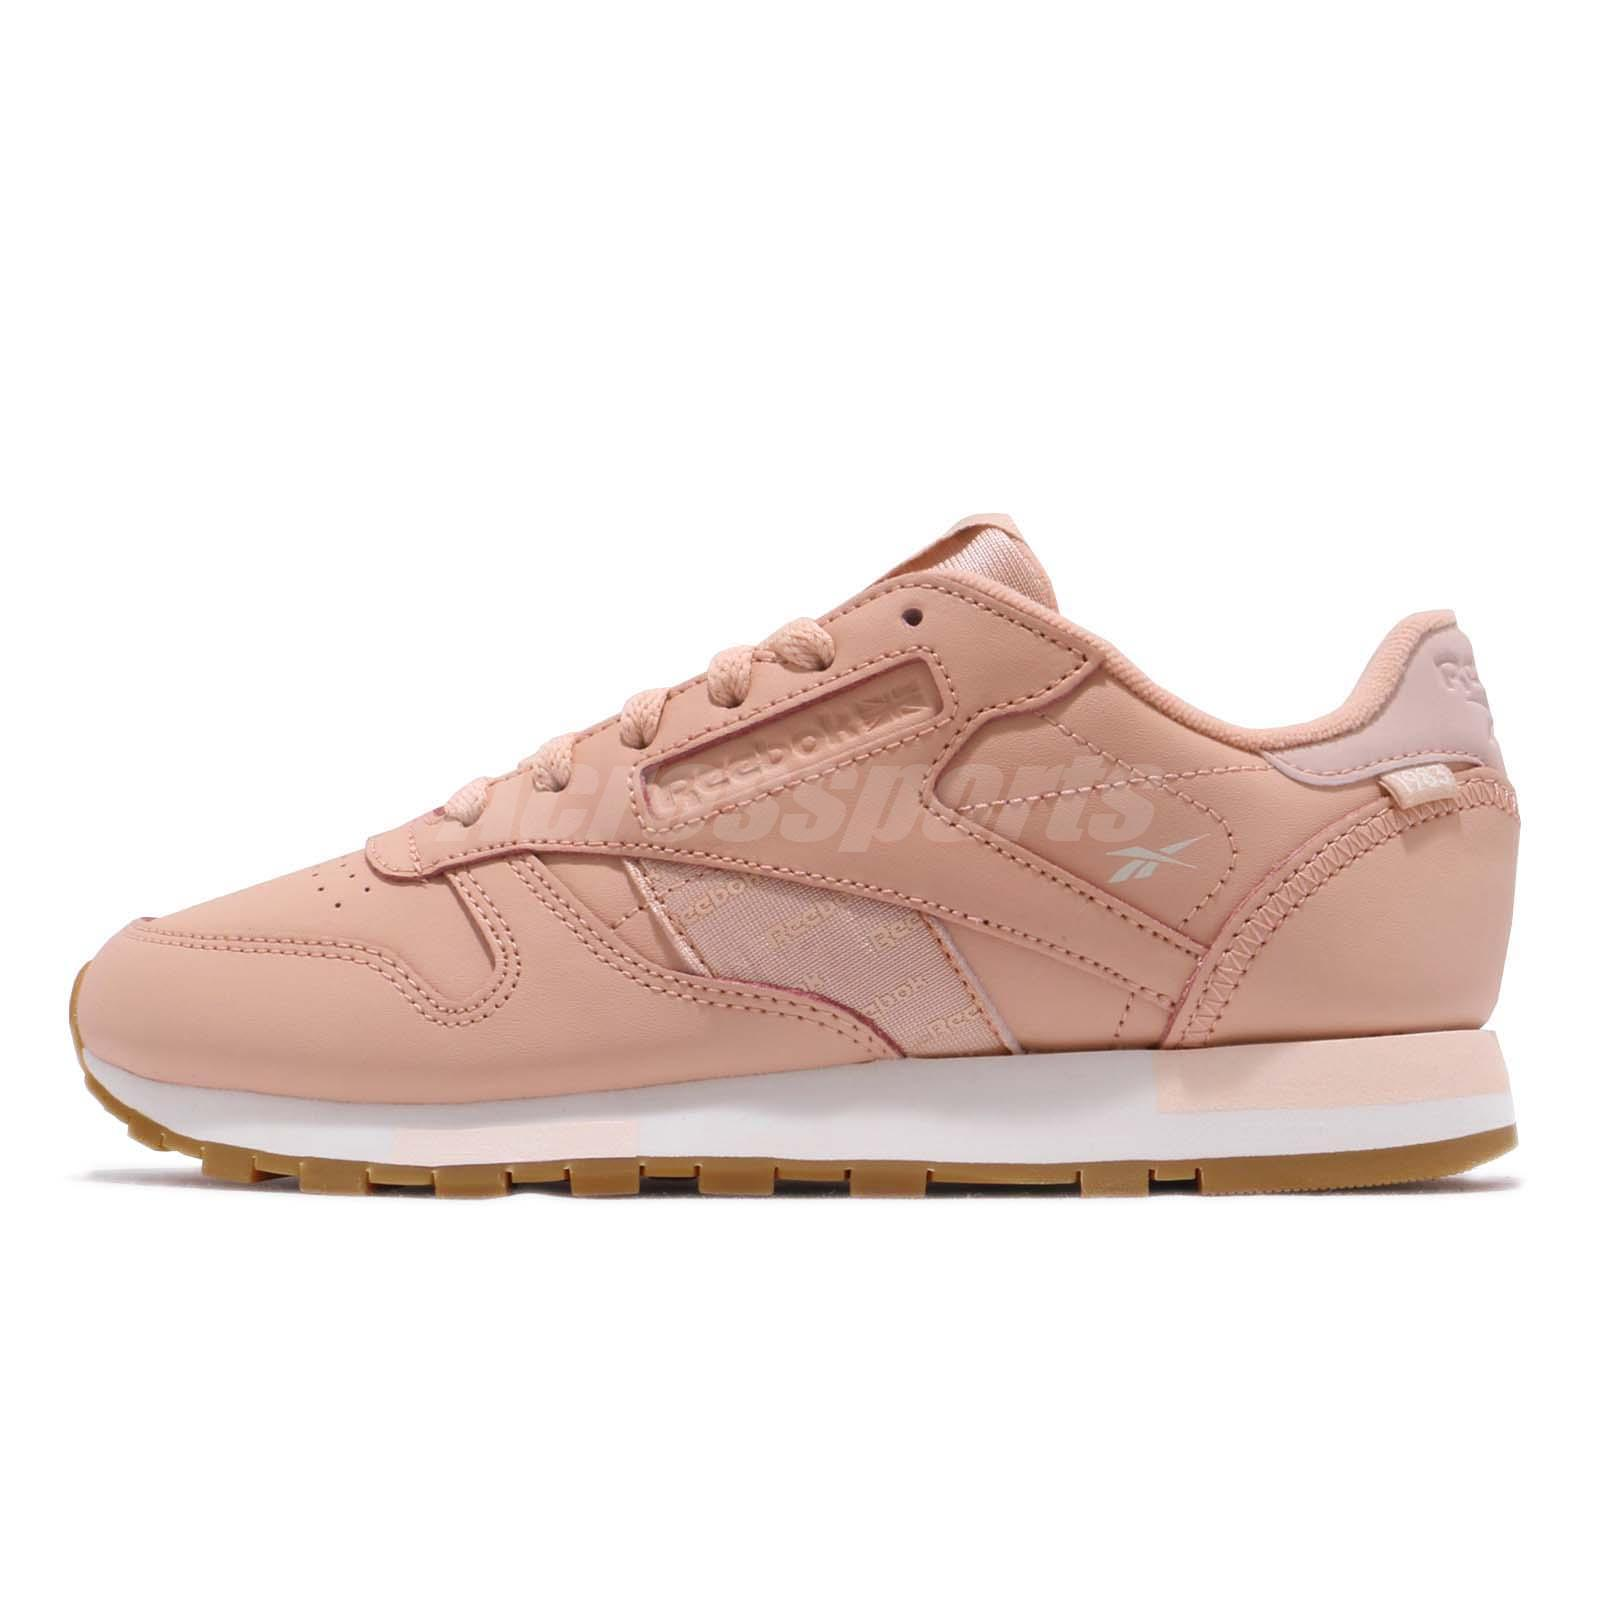 cf22a30446068 Reebok Classic Leather Altered Rose Cloud Gold Gum Women Shoes Sneaker  DV5236